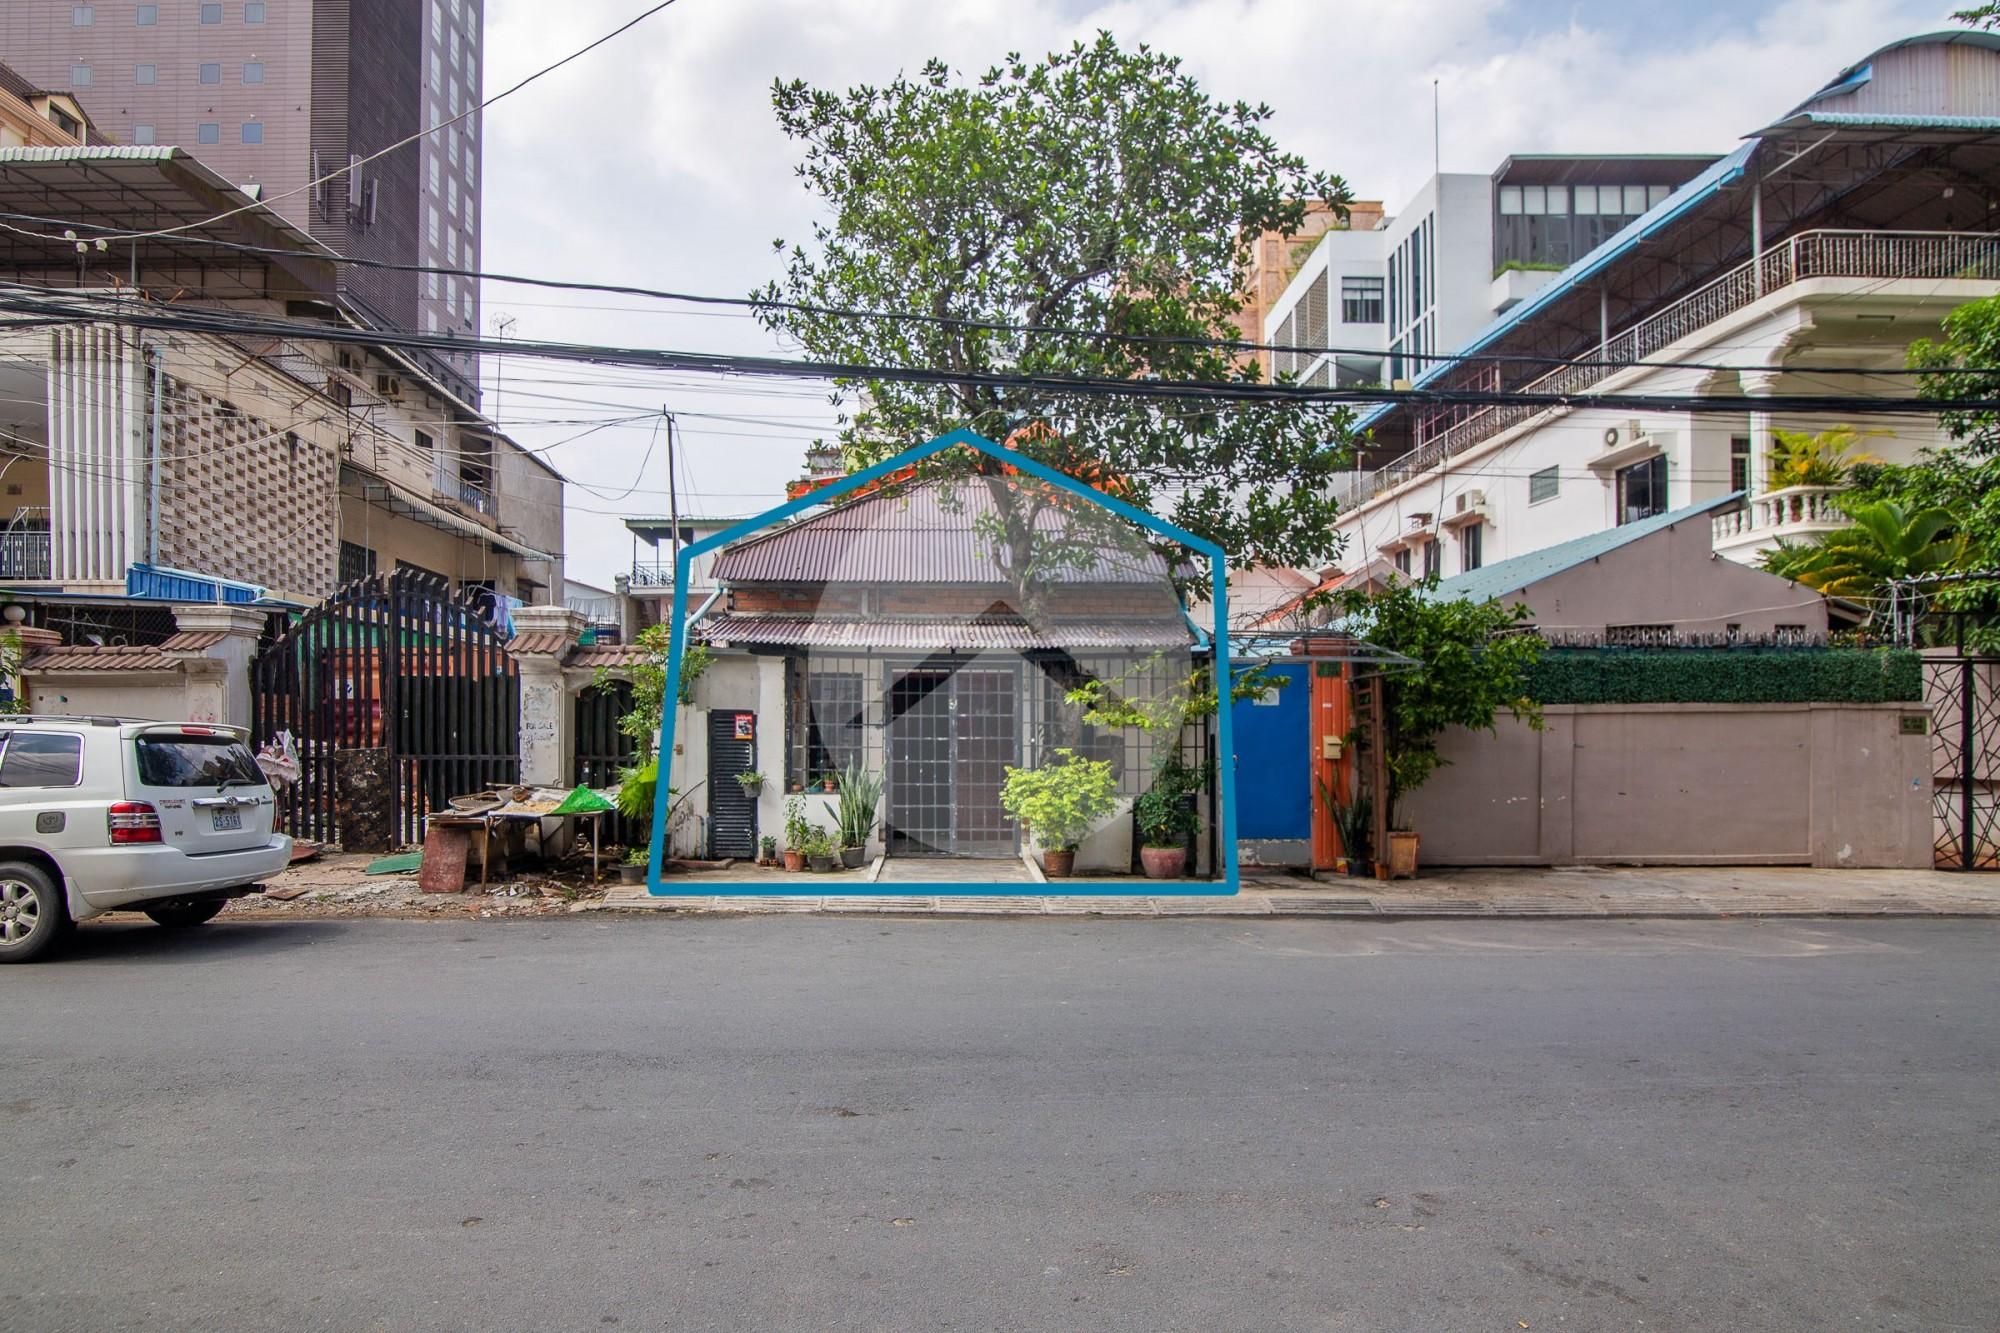 113 Sqm Retail Space For Rent - BKK1, Phnom Penh